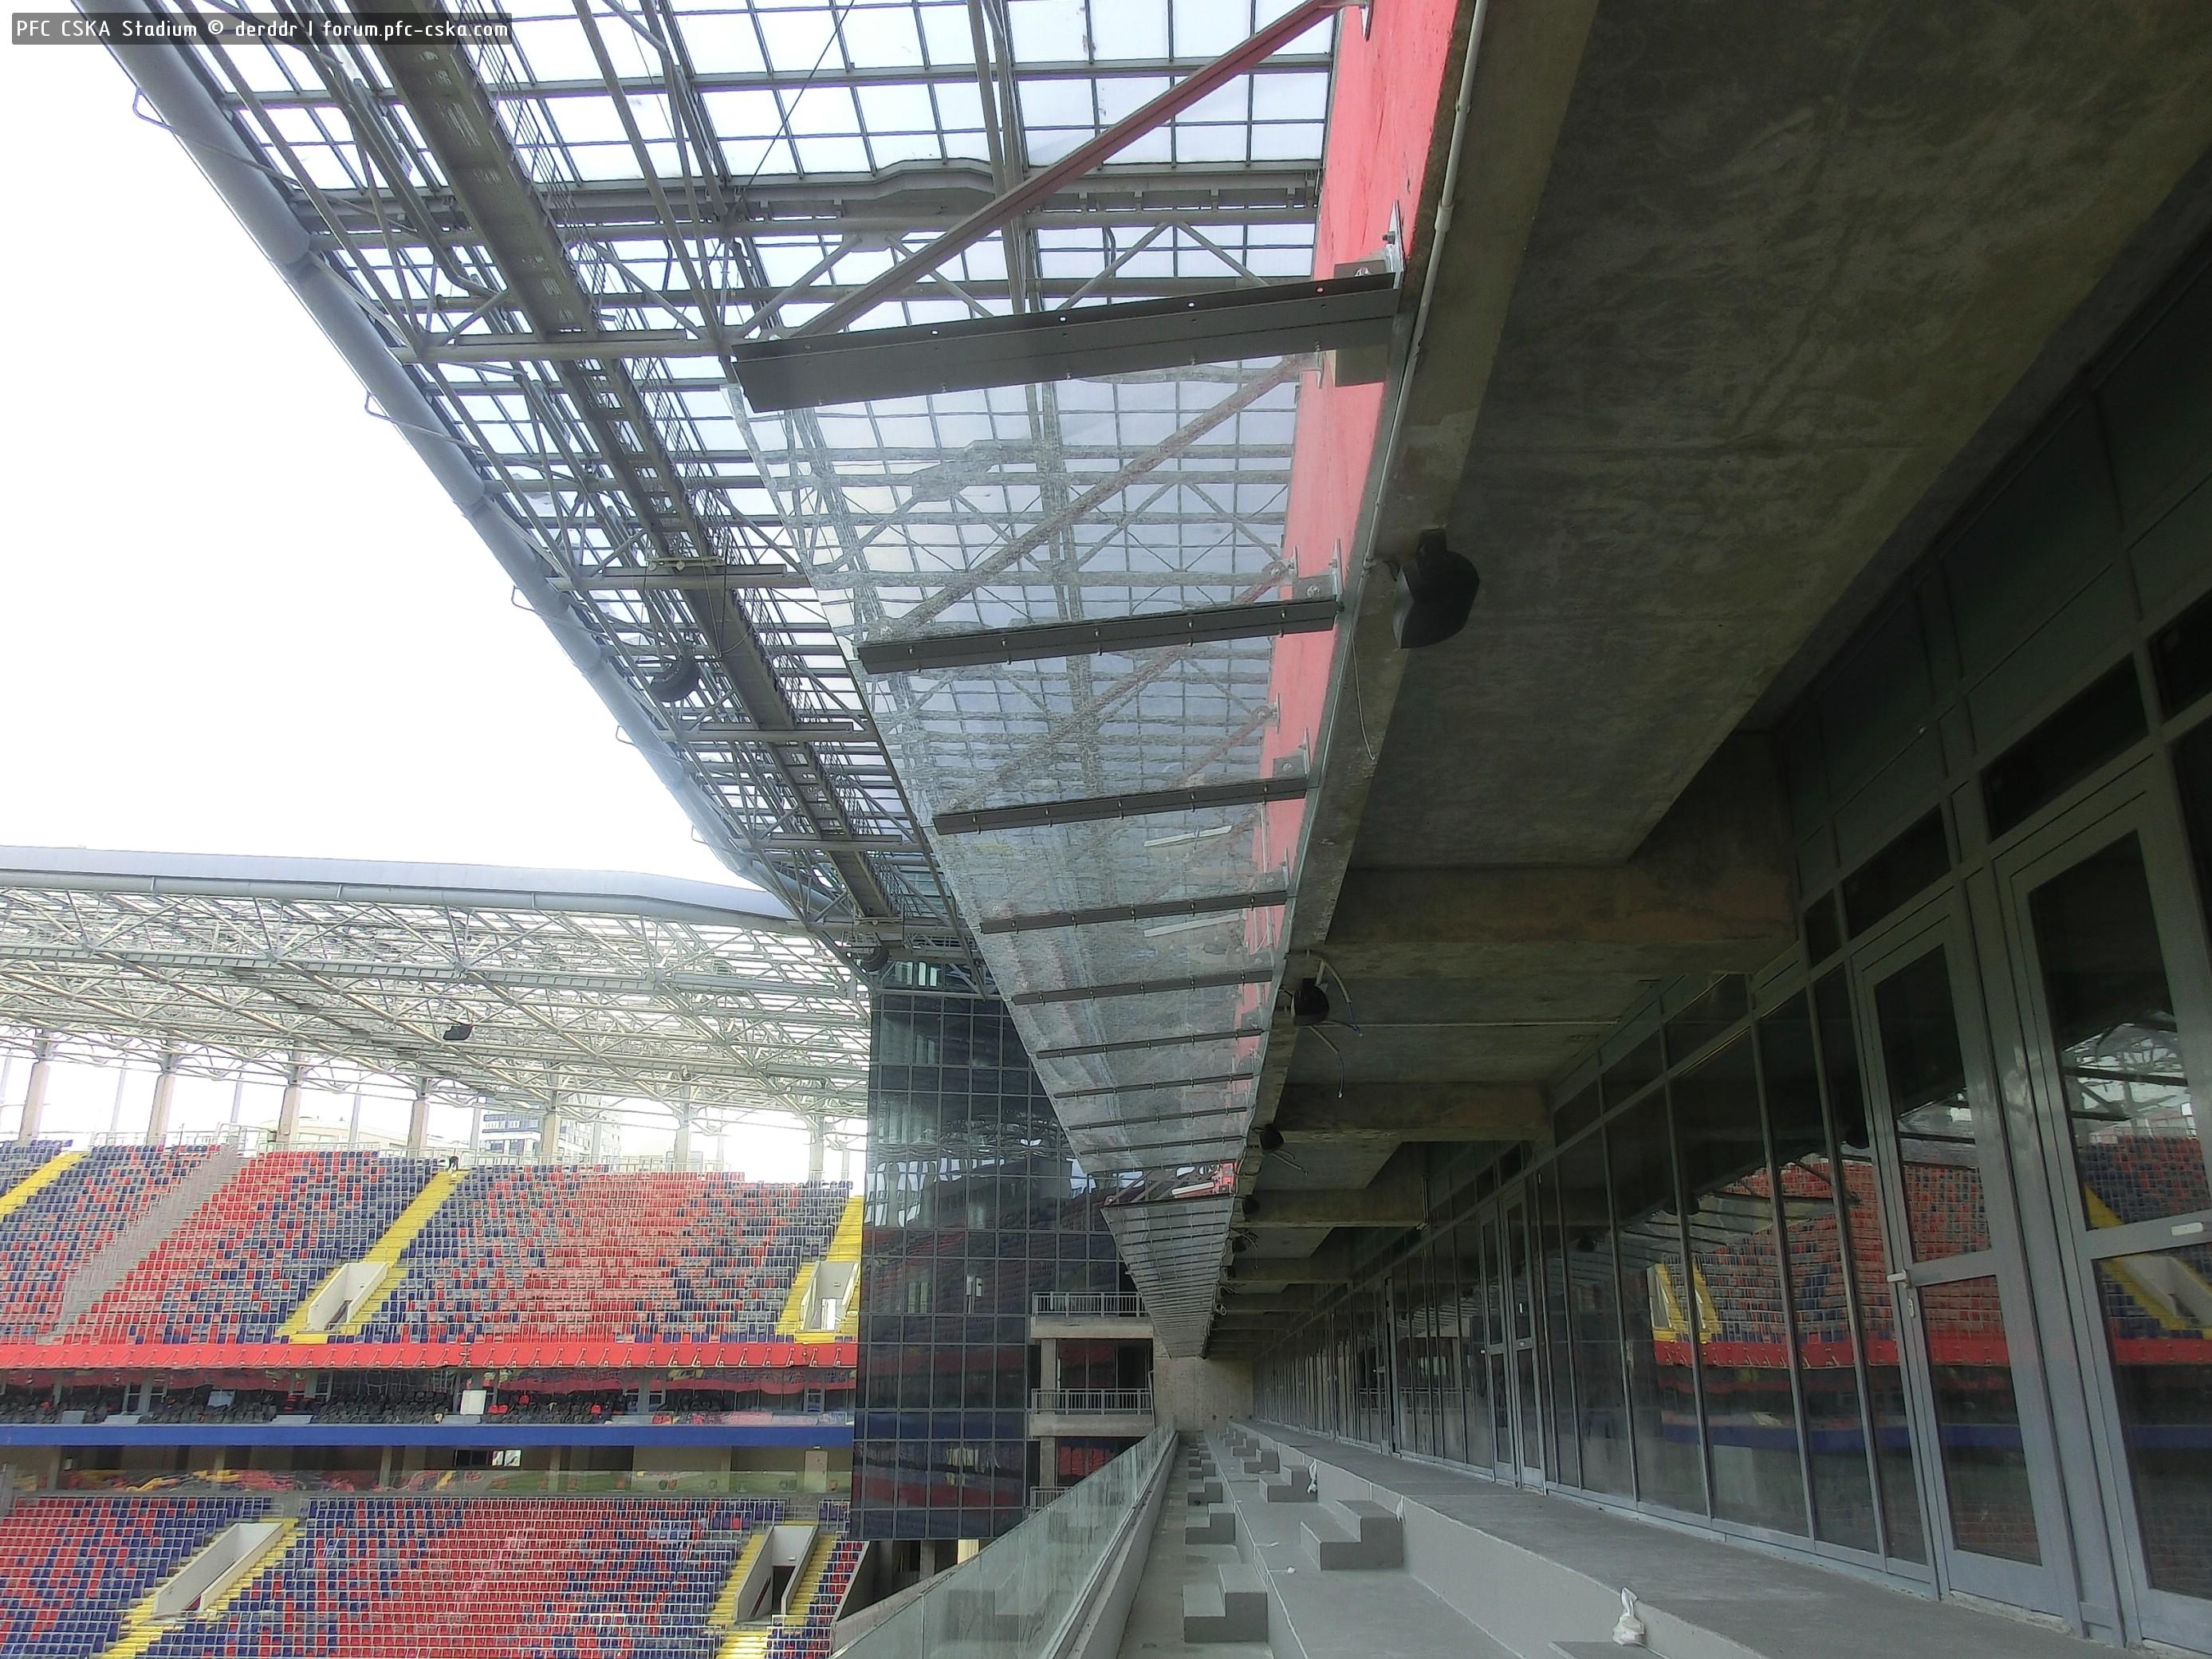 скайбокс на стадионе цска фото также представлены озвучки